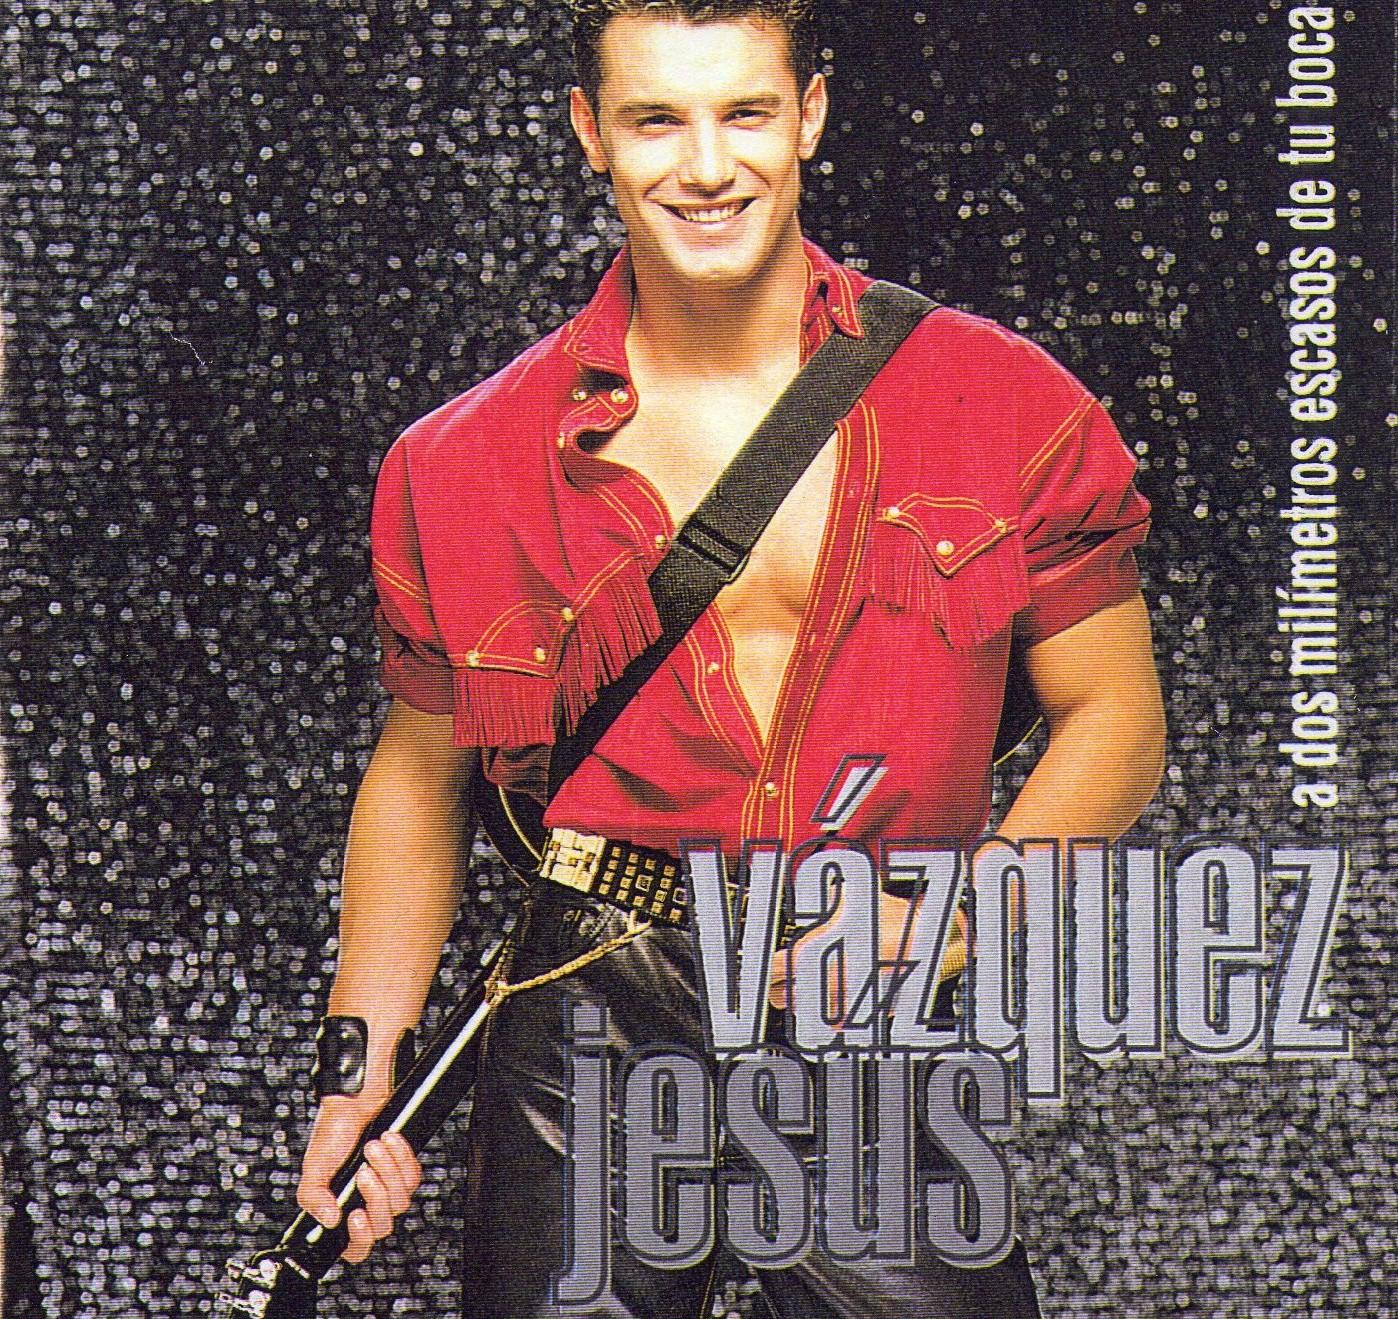 http://2.bp.blogspot.com/-ELo3kHavivk/TVOK5cs5DMI/AAAAAAAAAMA/VOiJqbJlqc0/s1600/Jesus+Vazquez.jpg